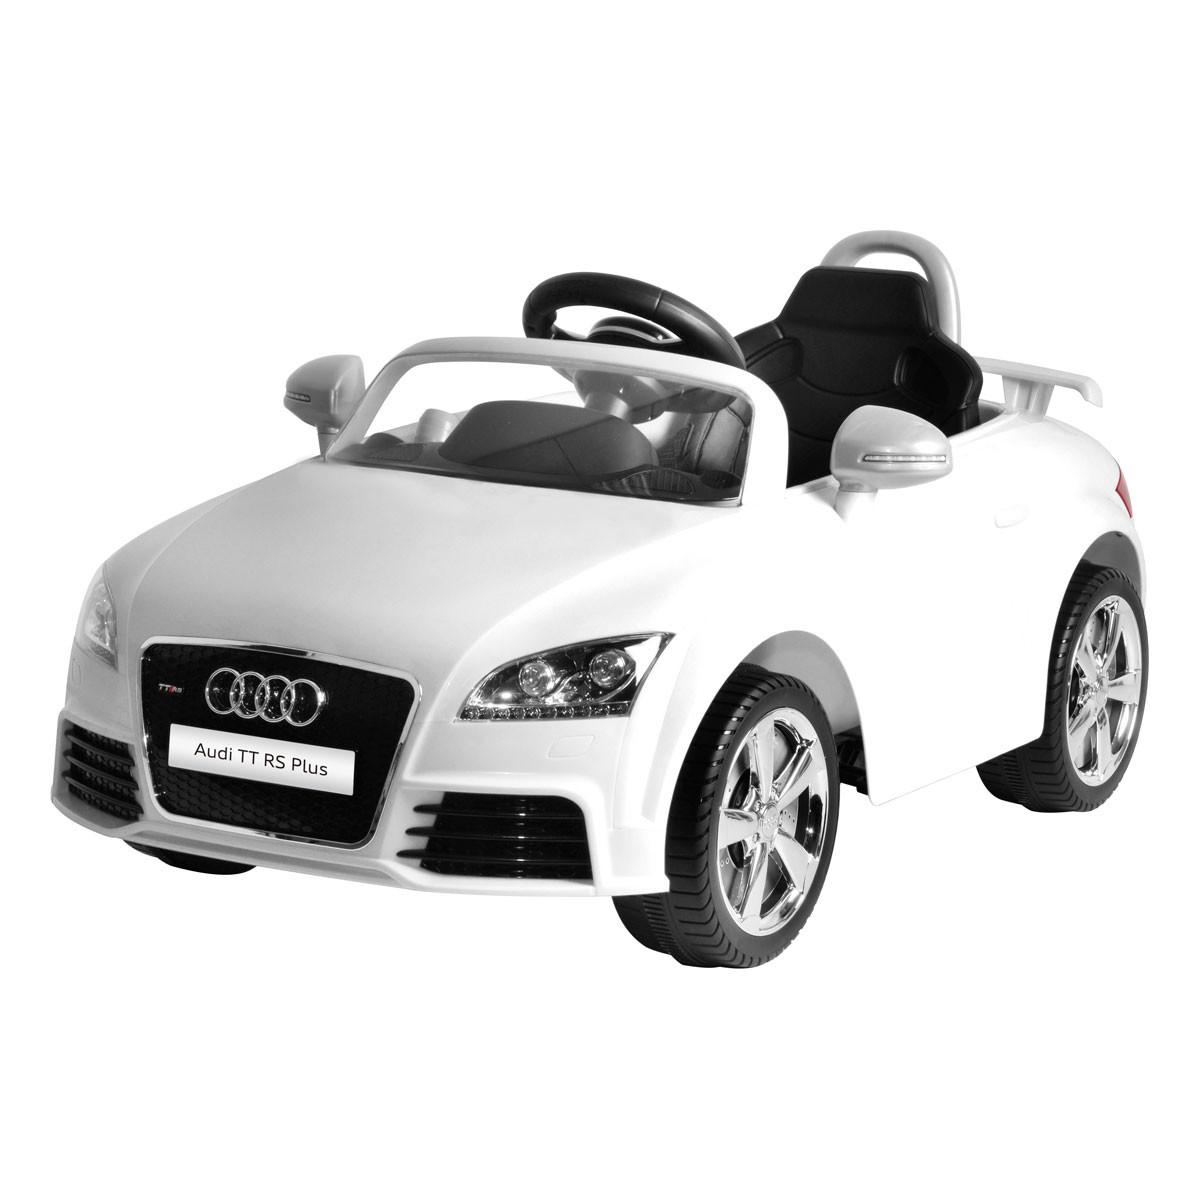 Mänguauto Buddy Toys BEC7120 Audi